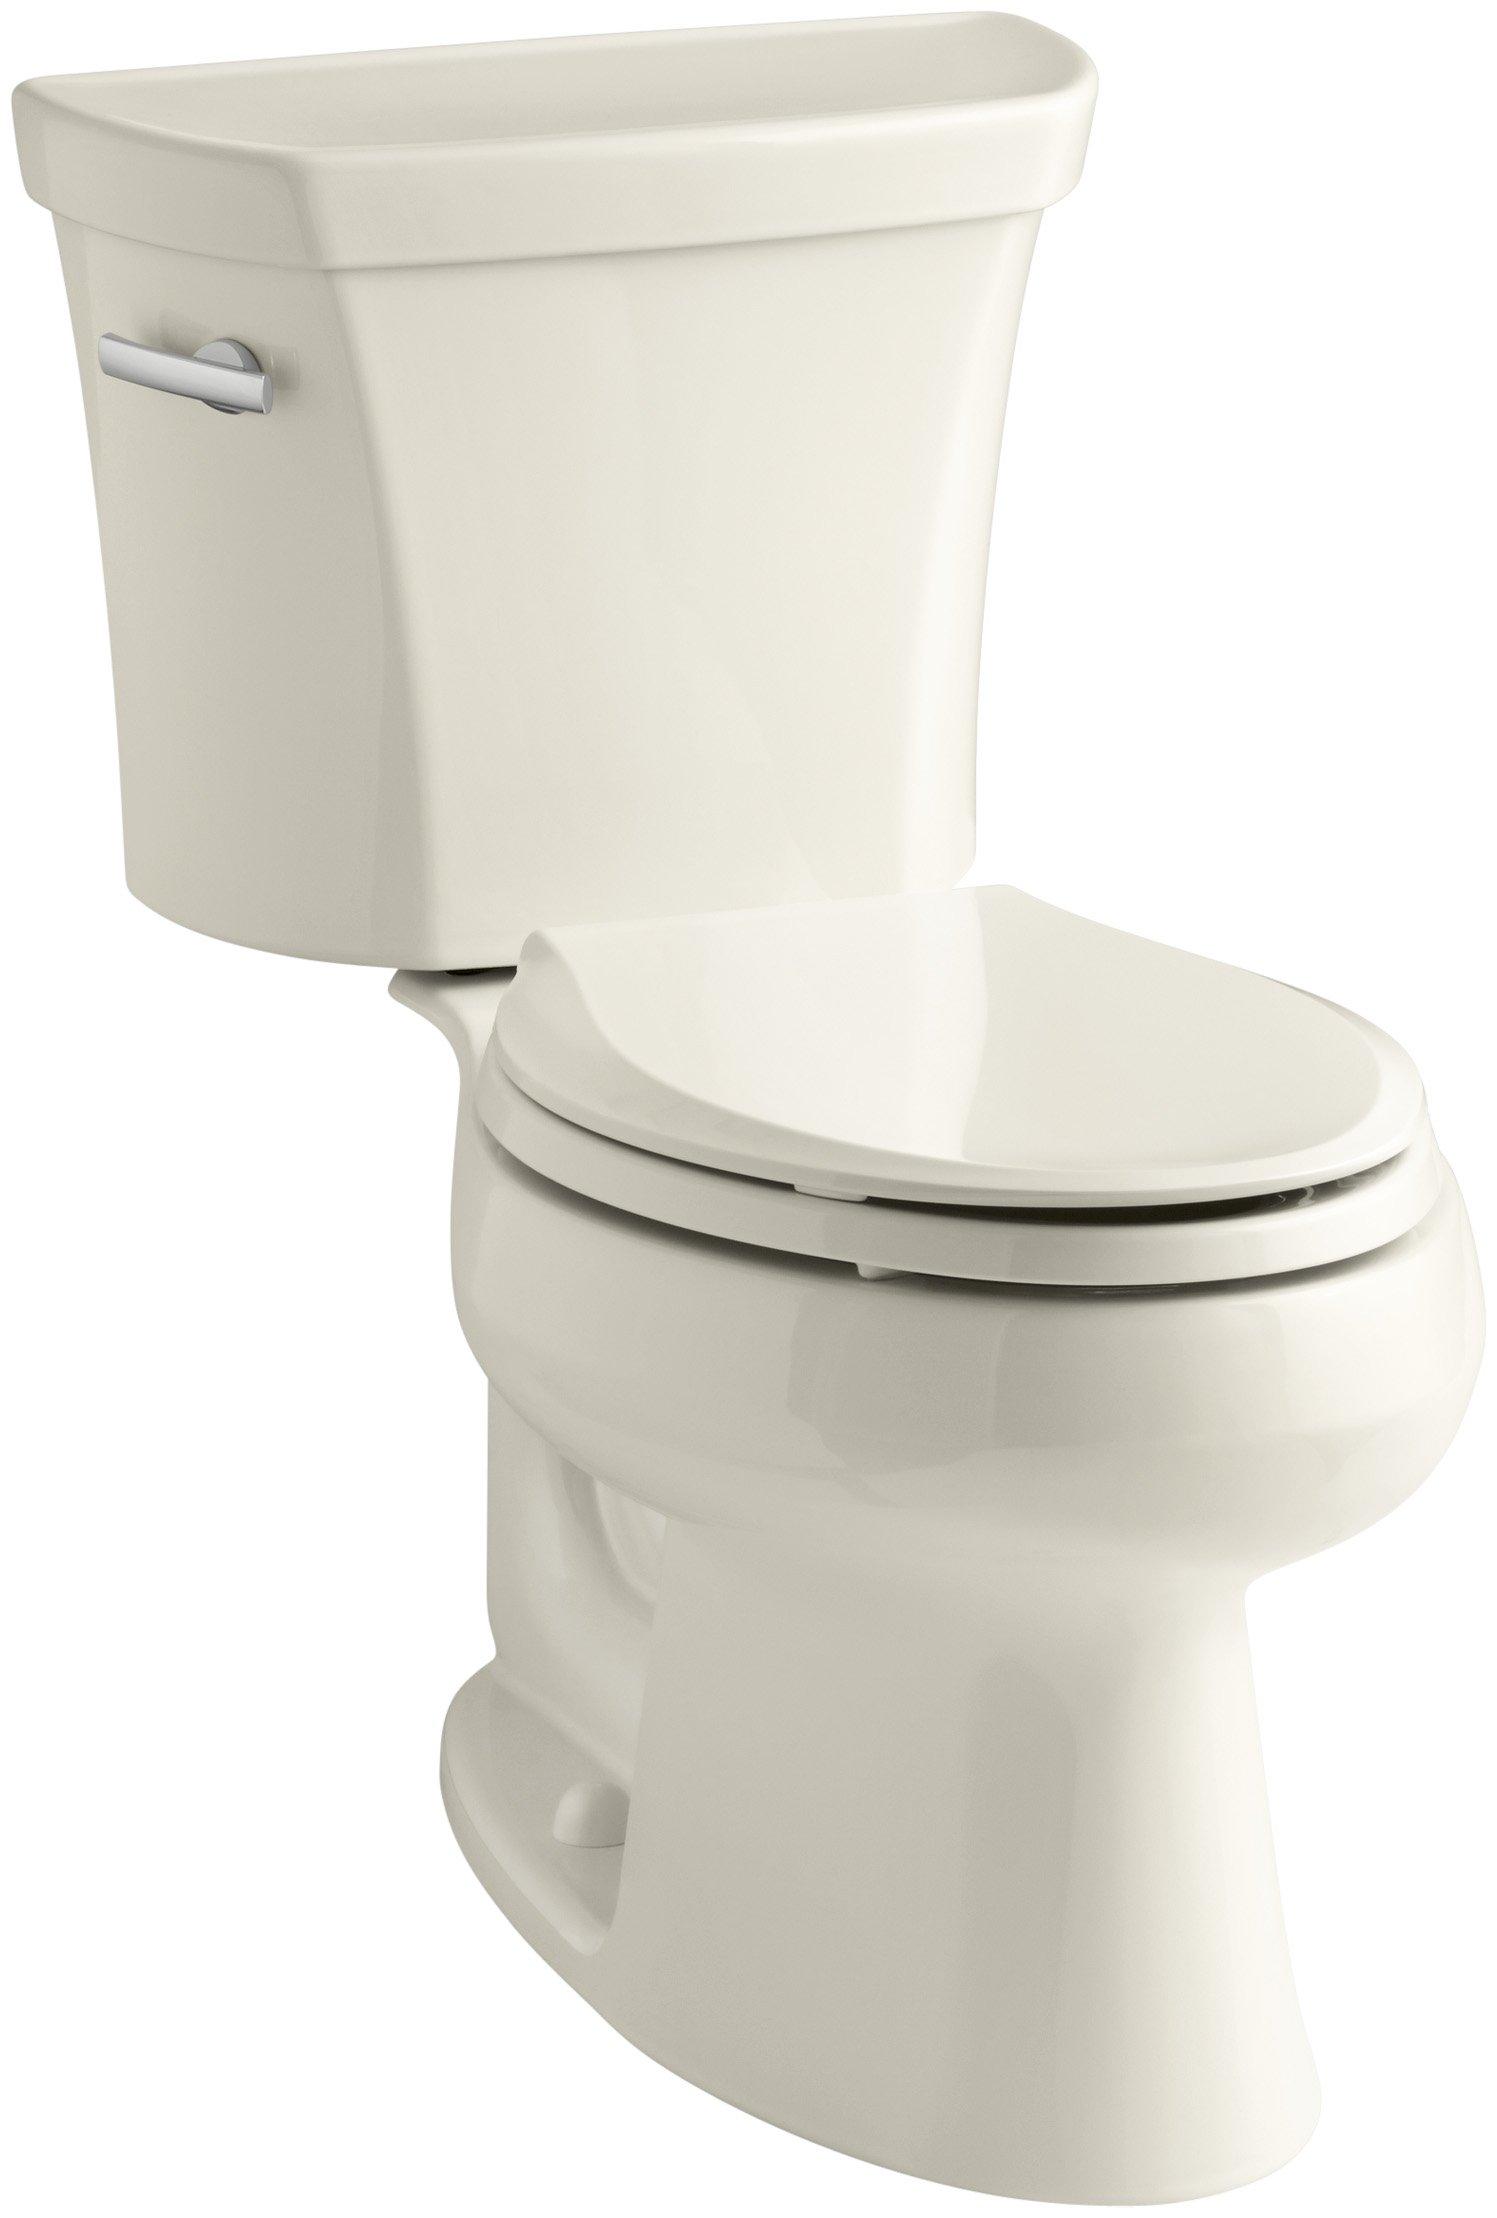 Kohler K 3978 47 Wellworth Elongated Toilet